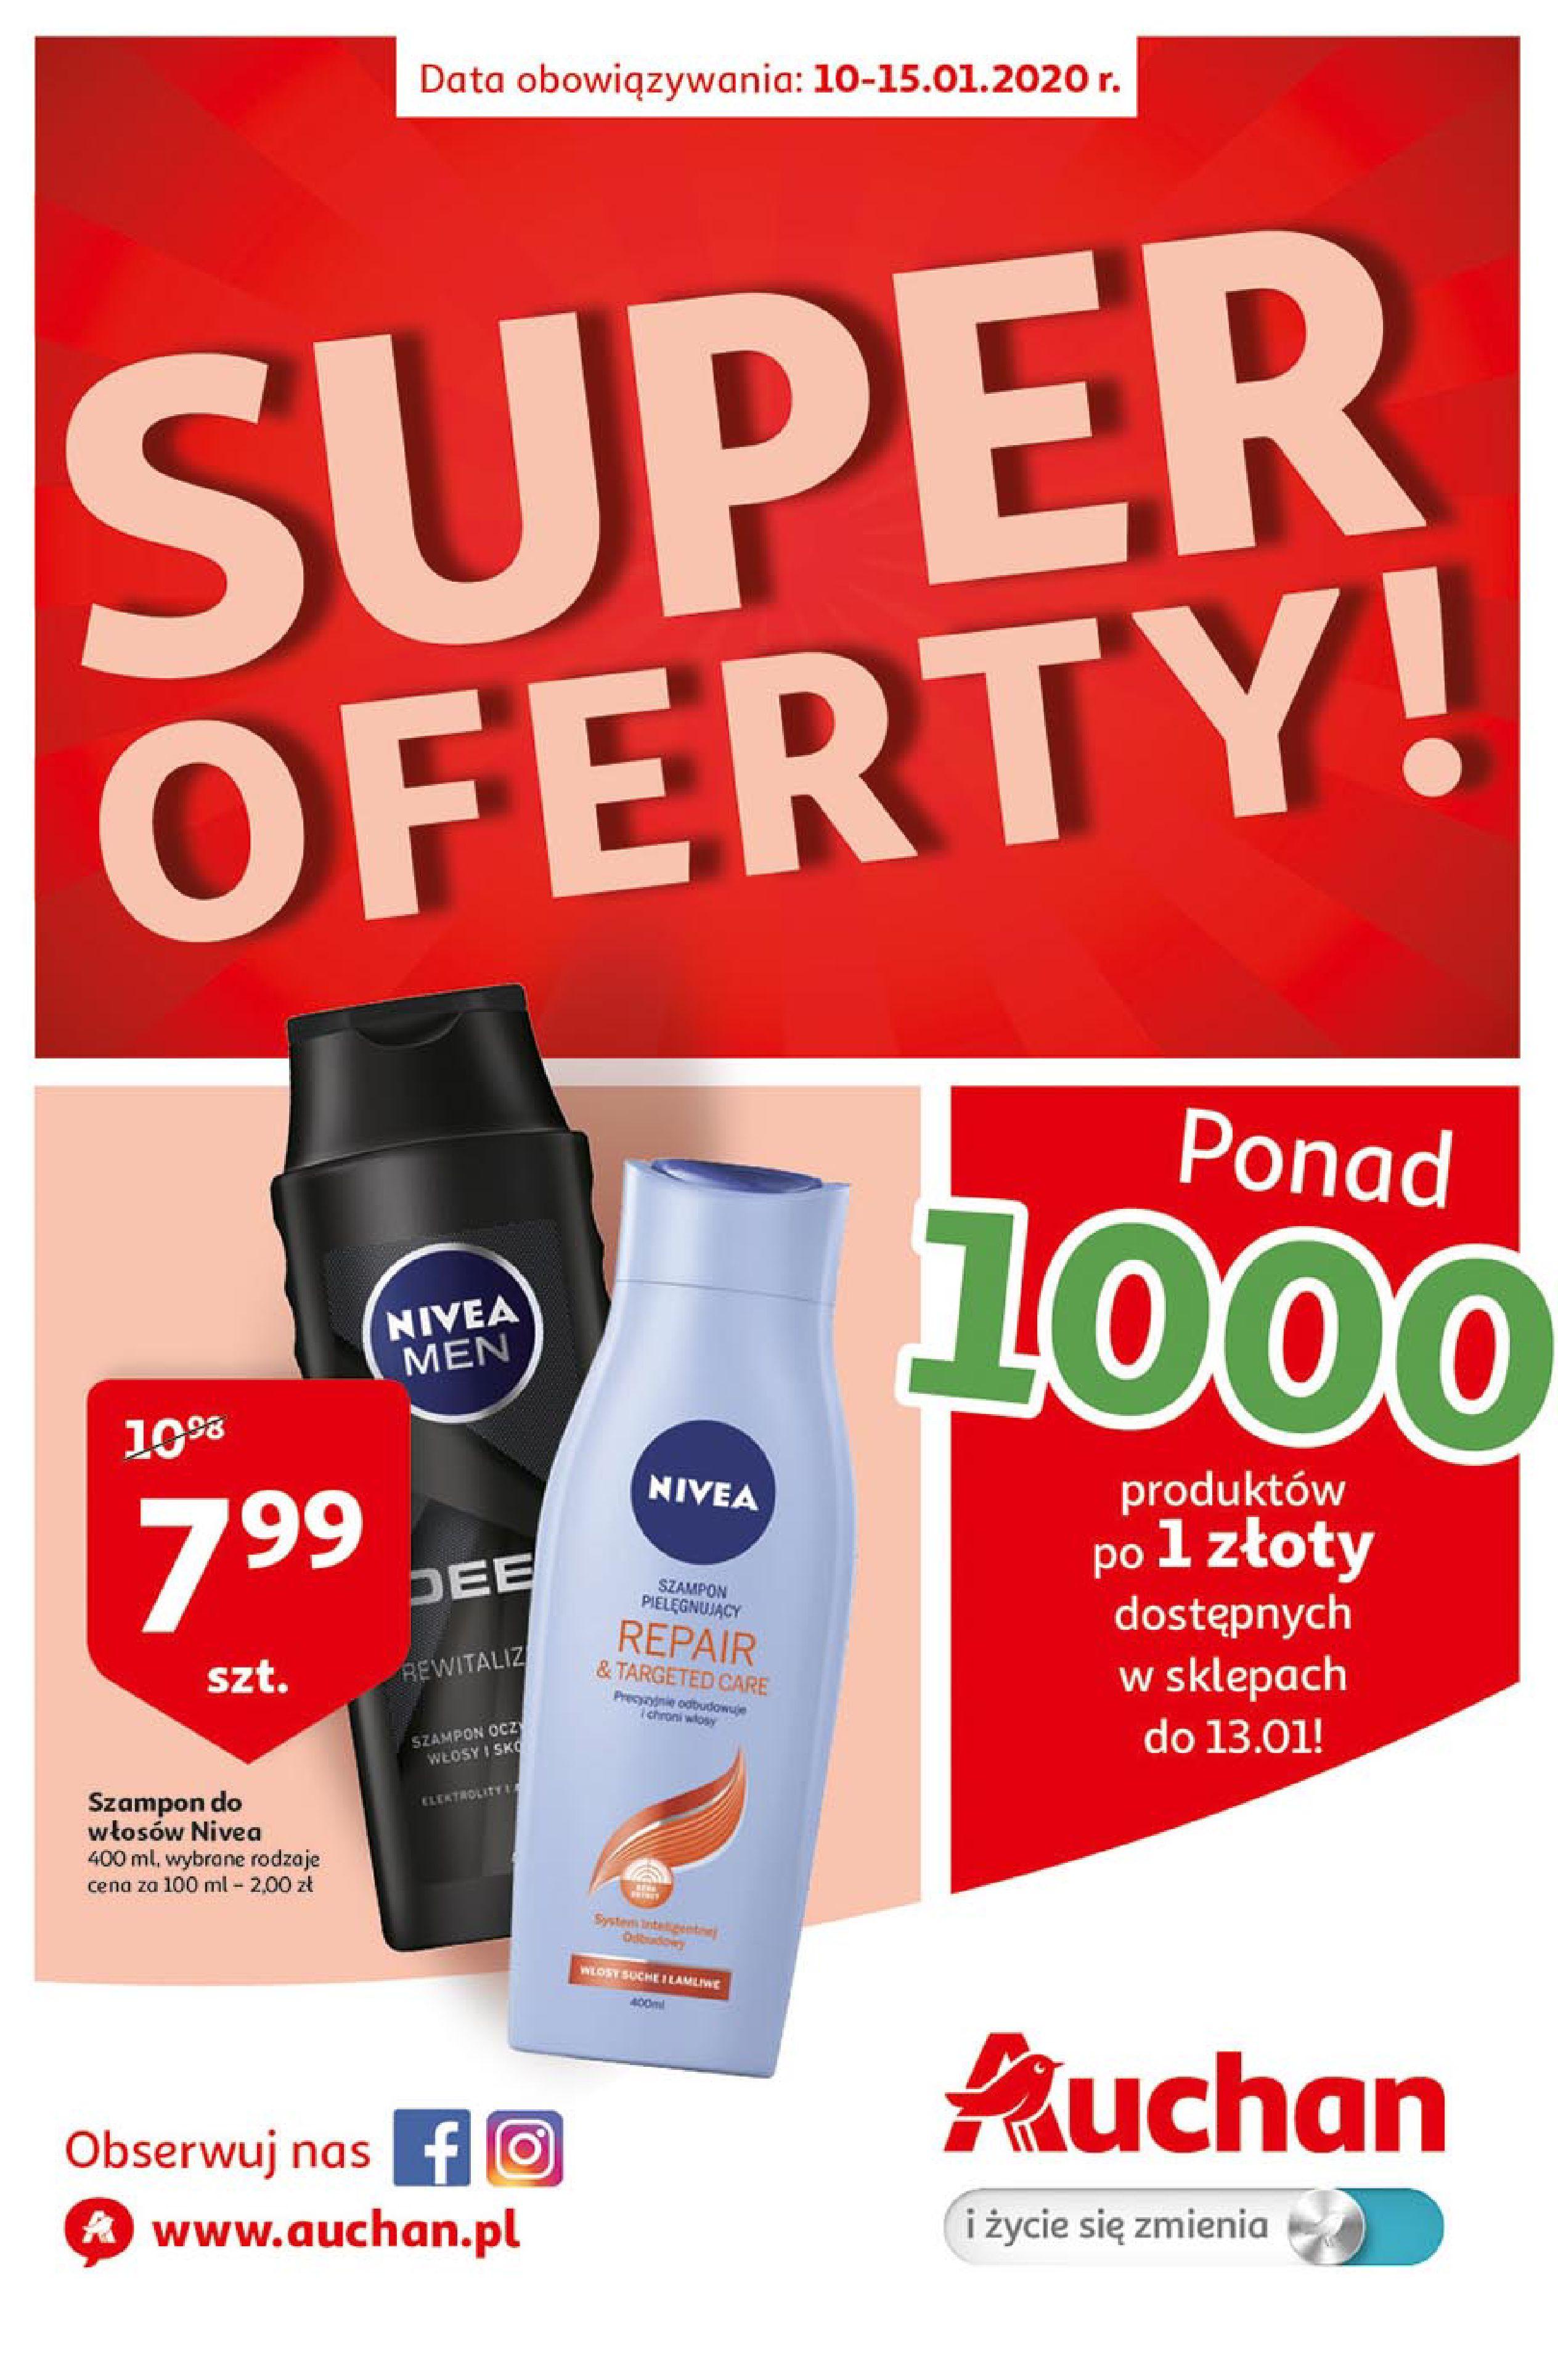 Gazetka Auchan - Super Oferty Hipermarkety-09.01.2020-15.01.2020-page-1